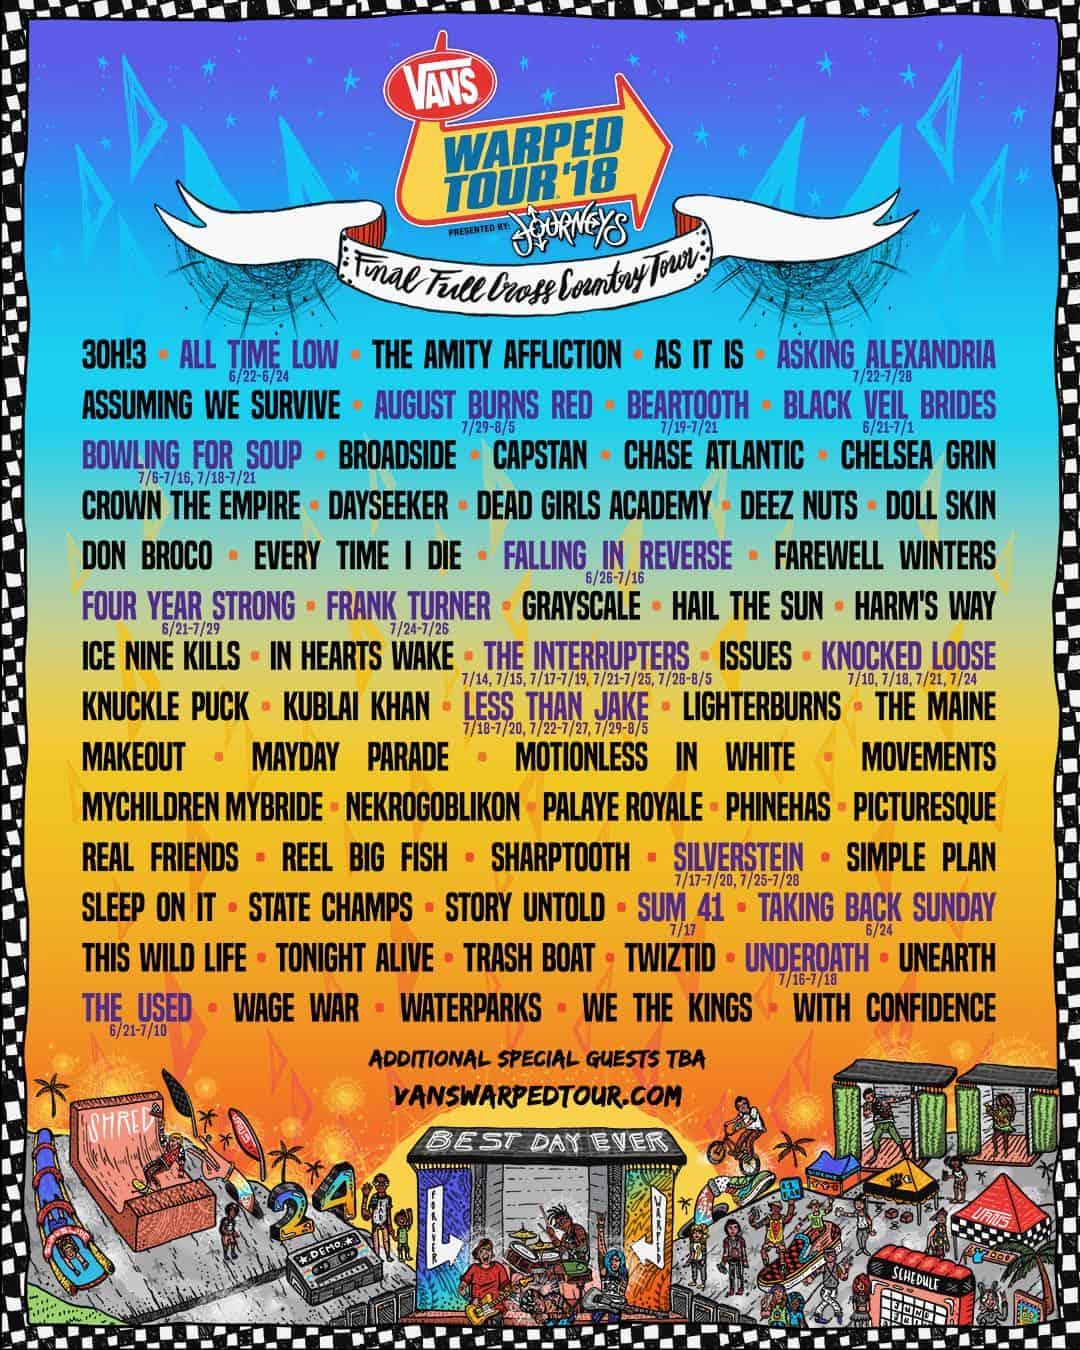 2018-Vans-Warped-Tour-Poster.jpg